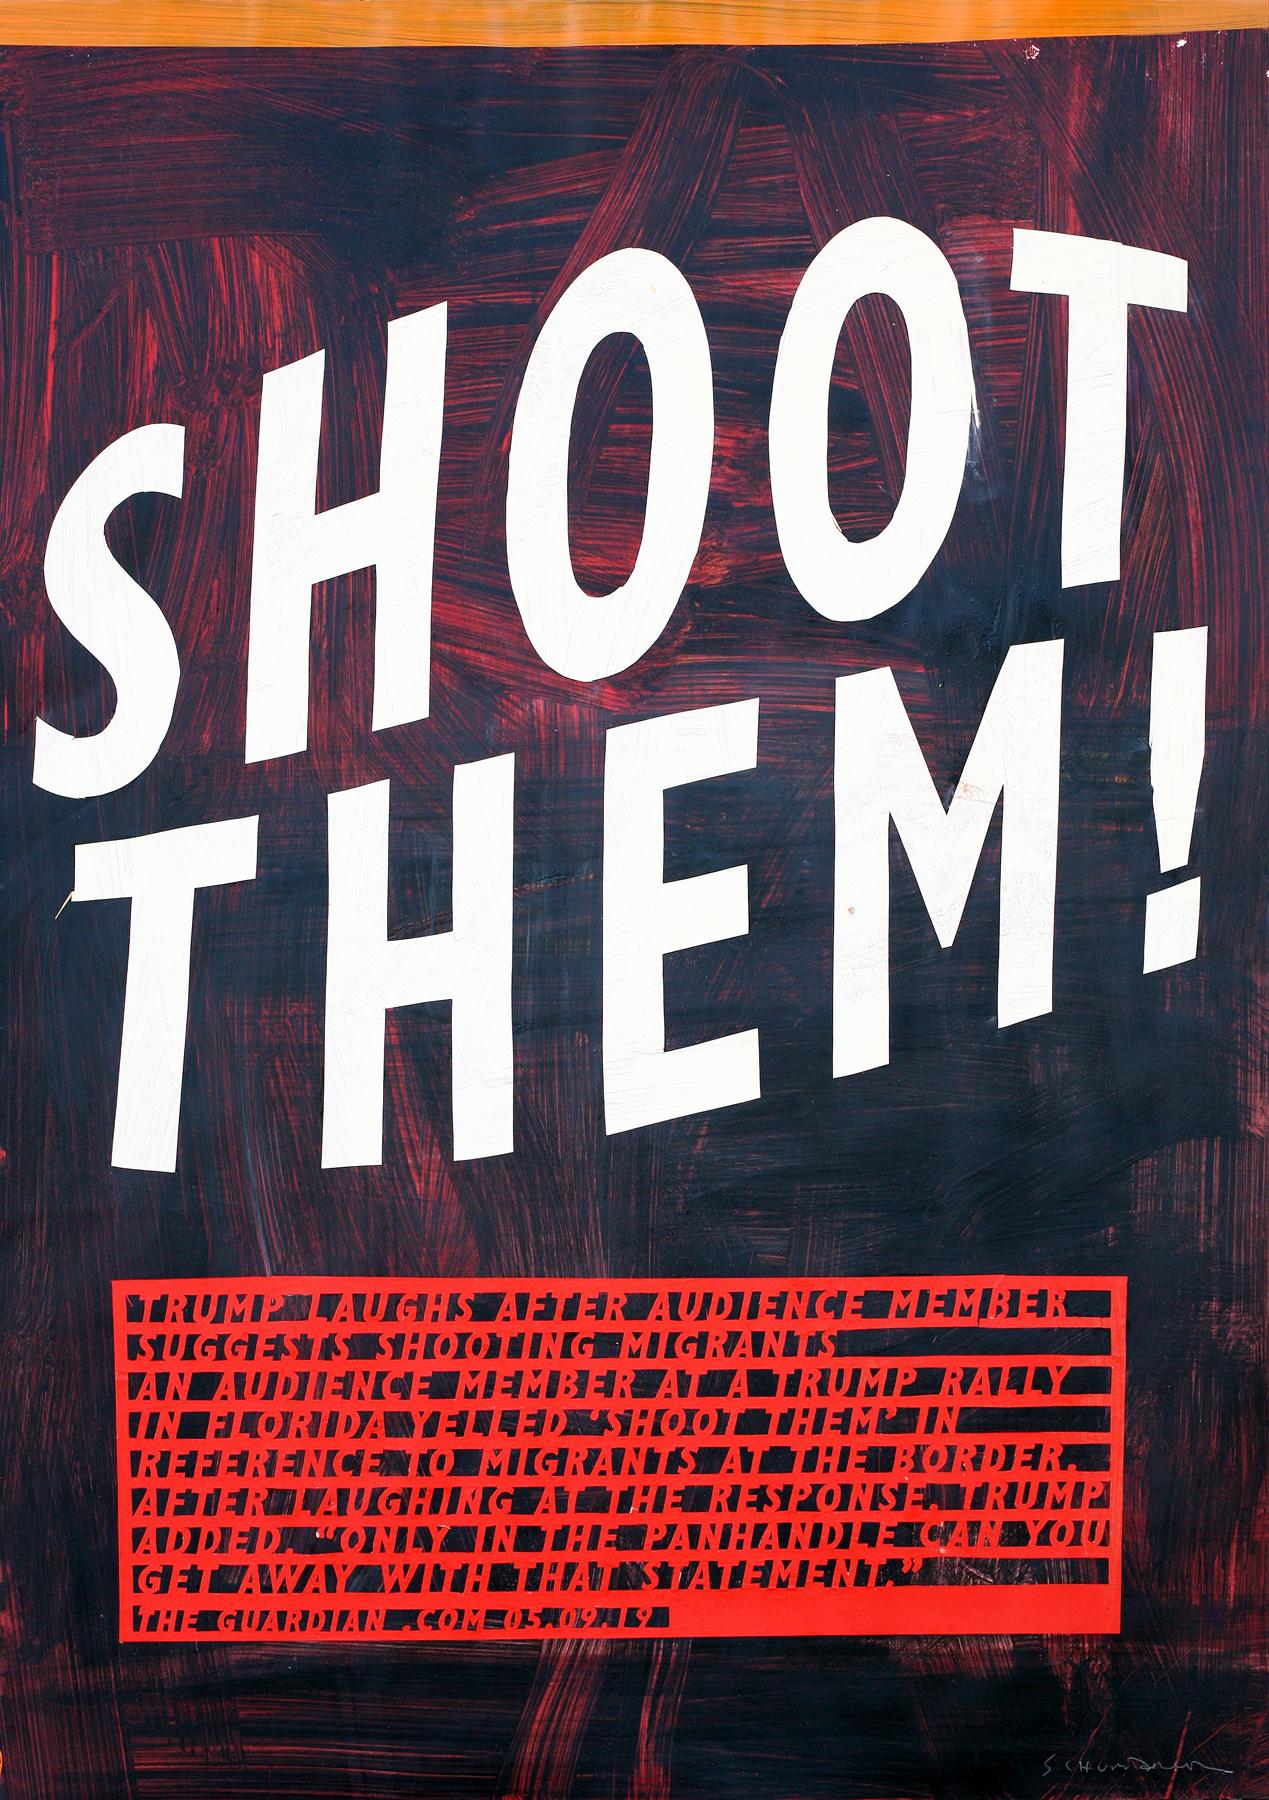 Shoot Them!